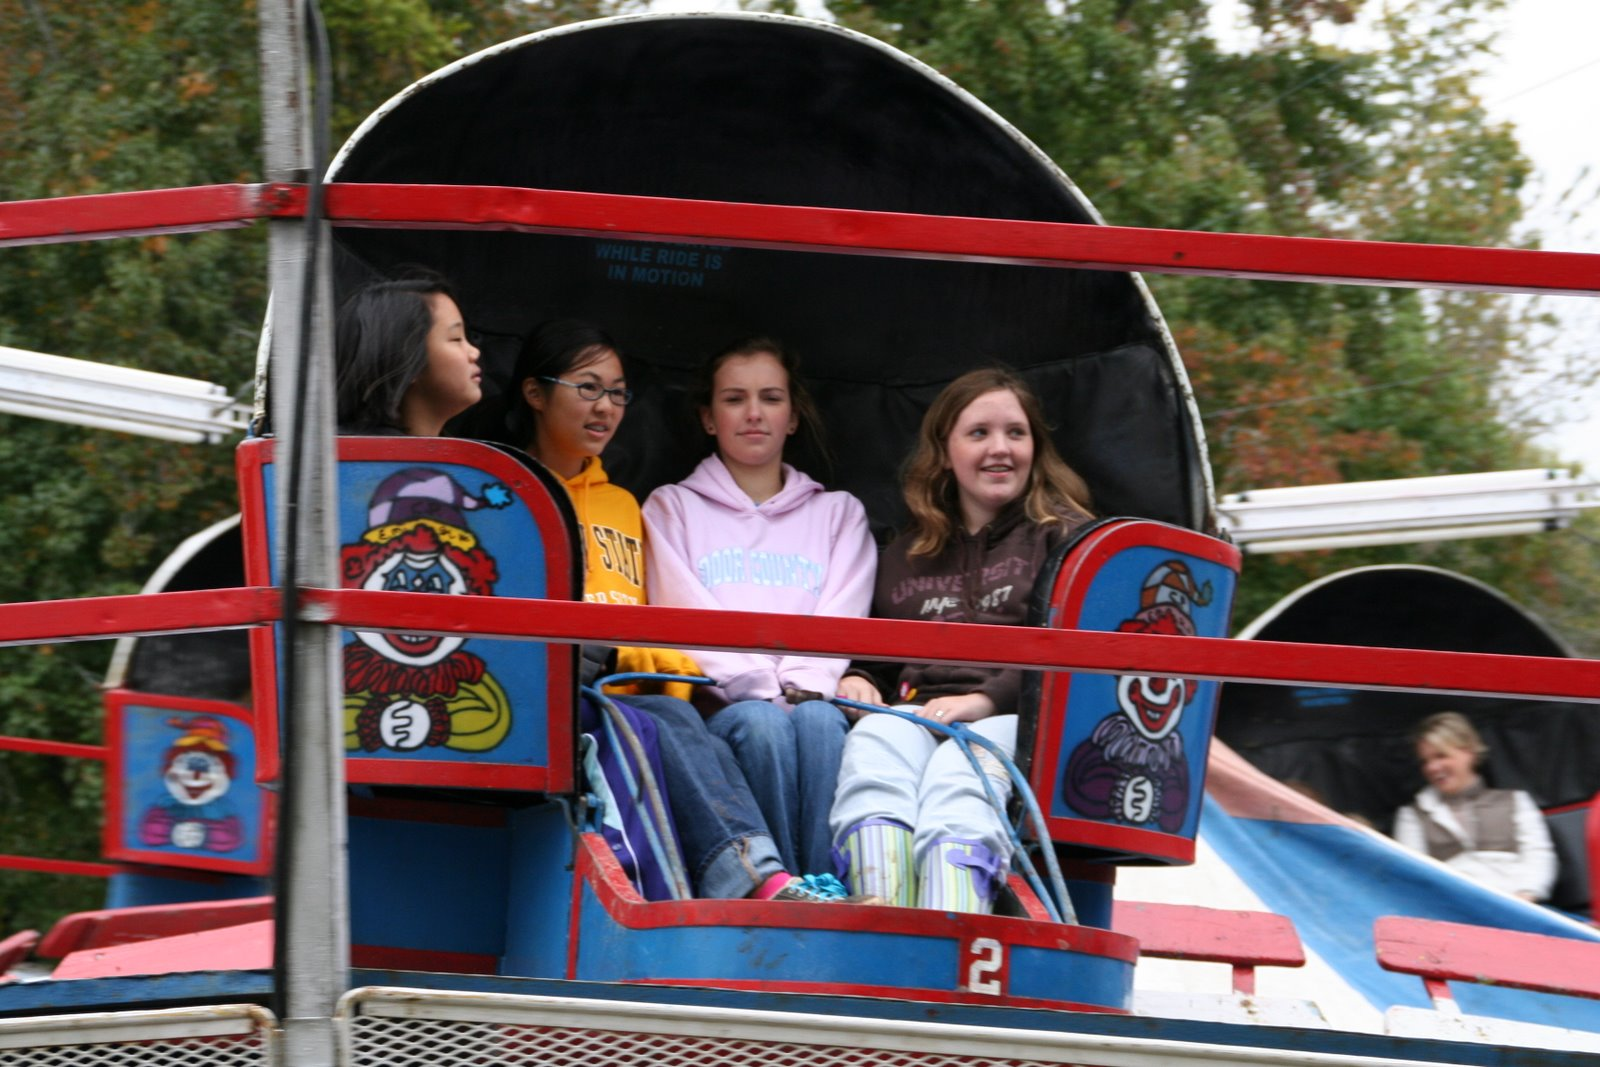 carnival-rides-39